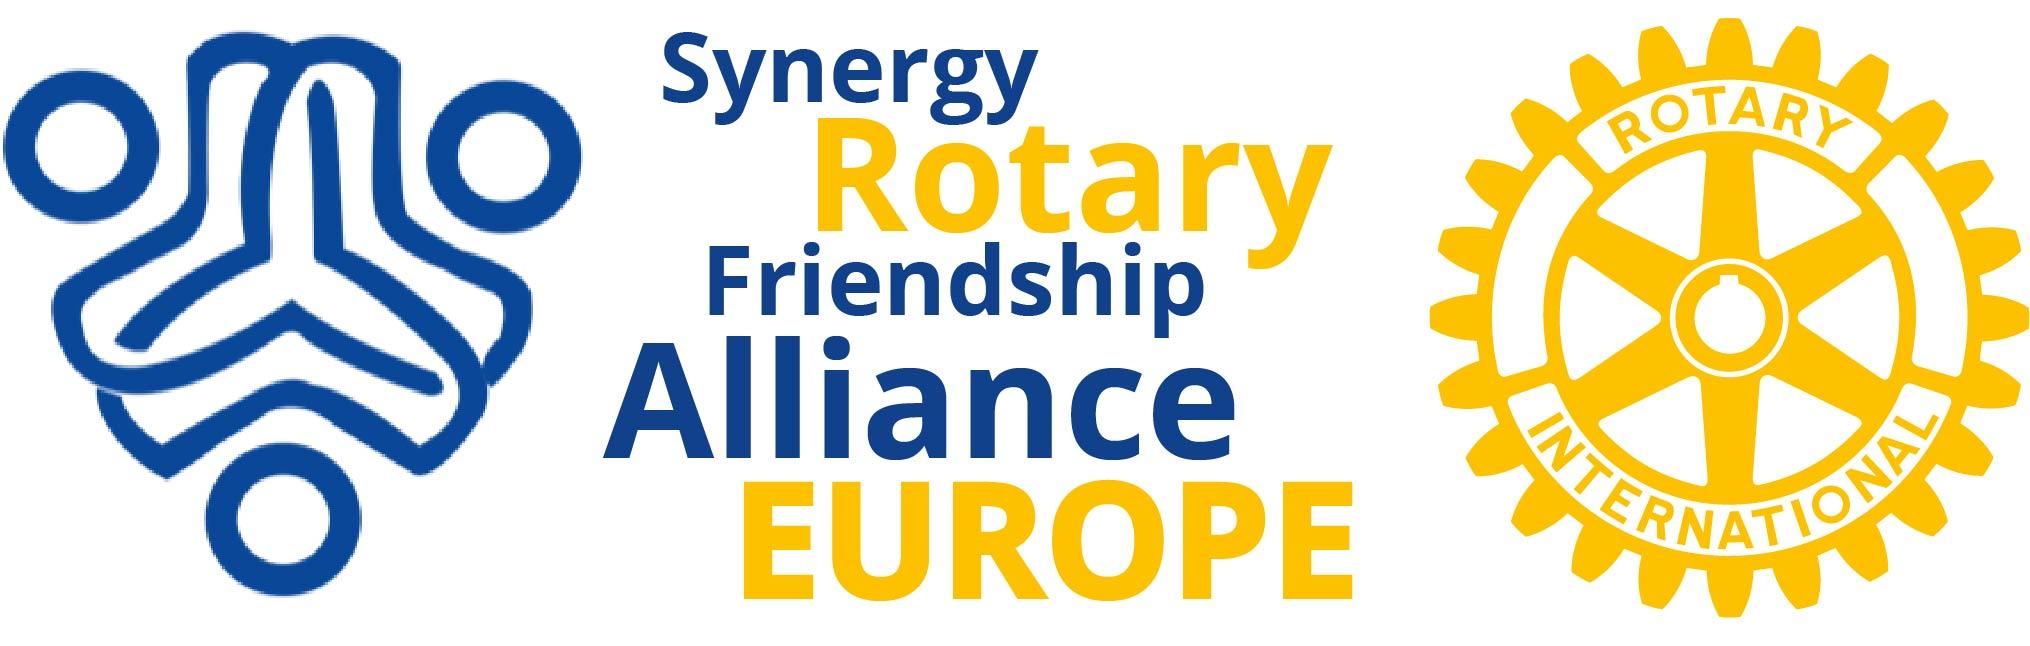 Rotary – Synergy – EUROPE